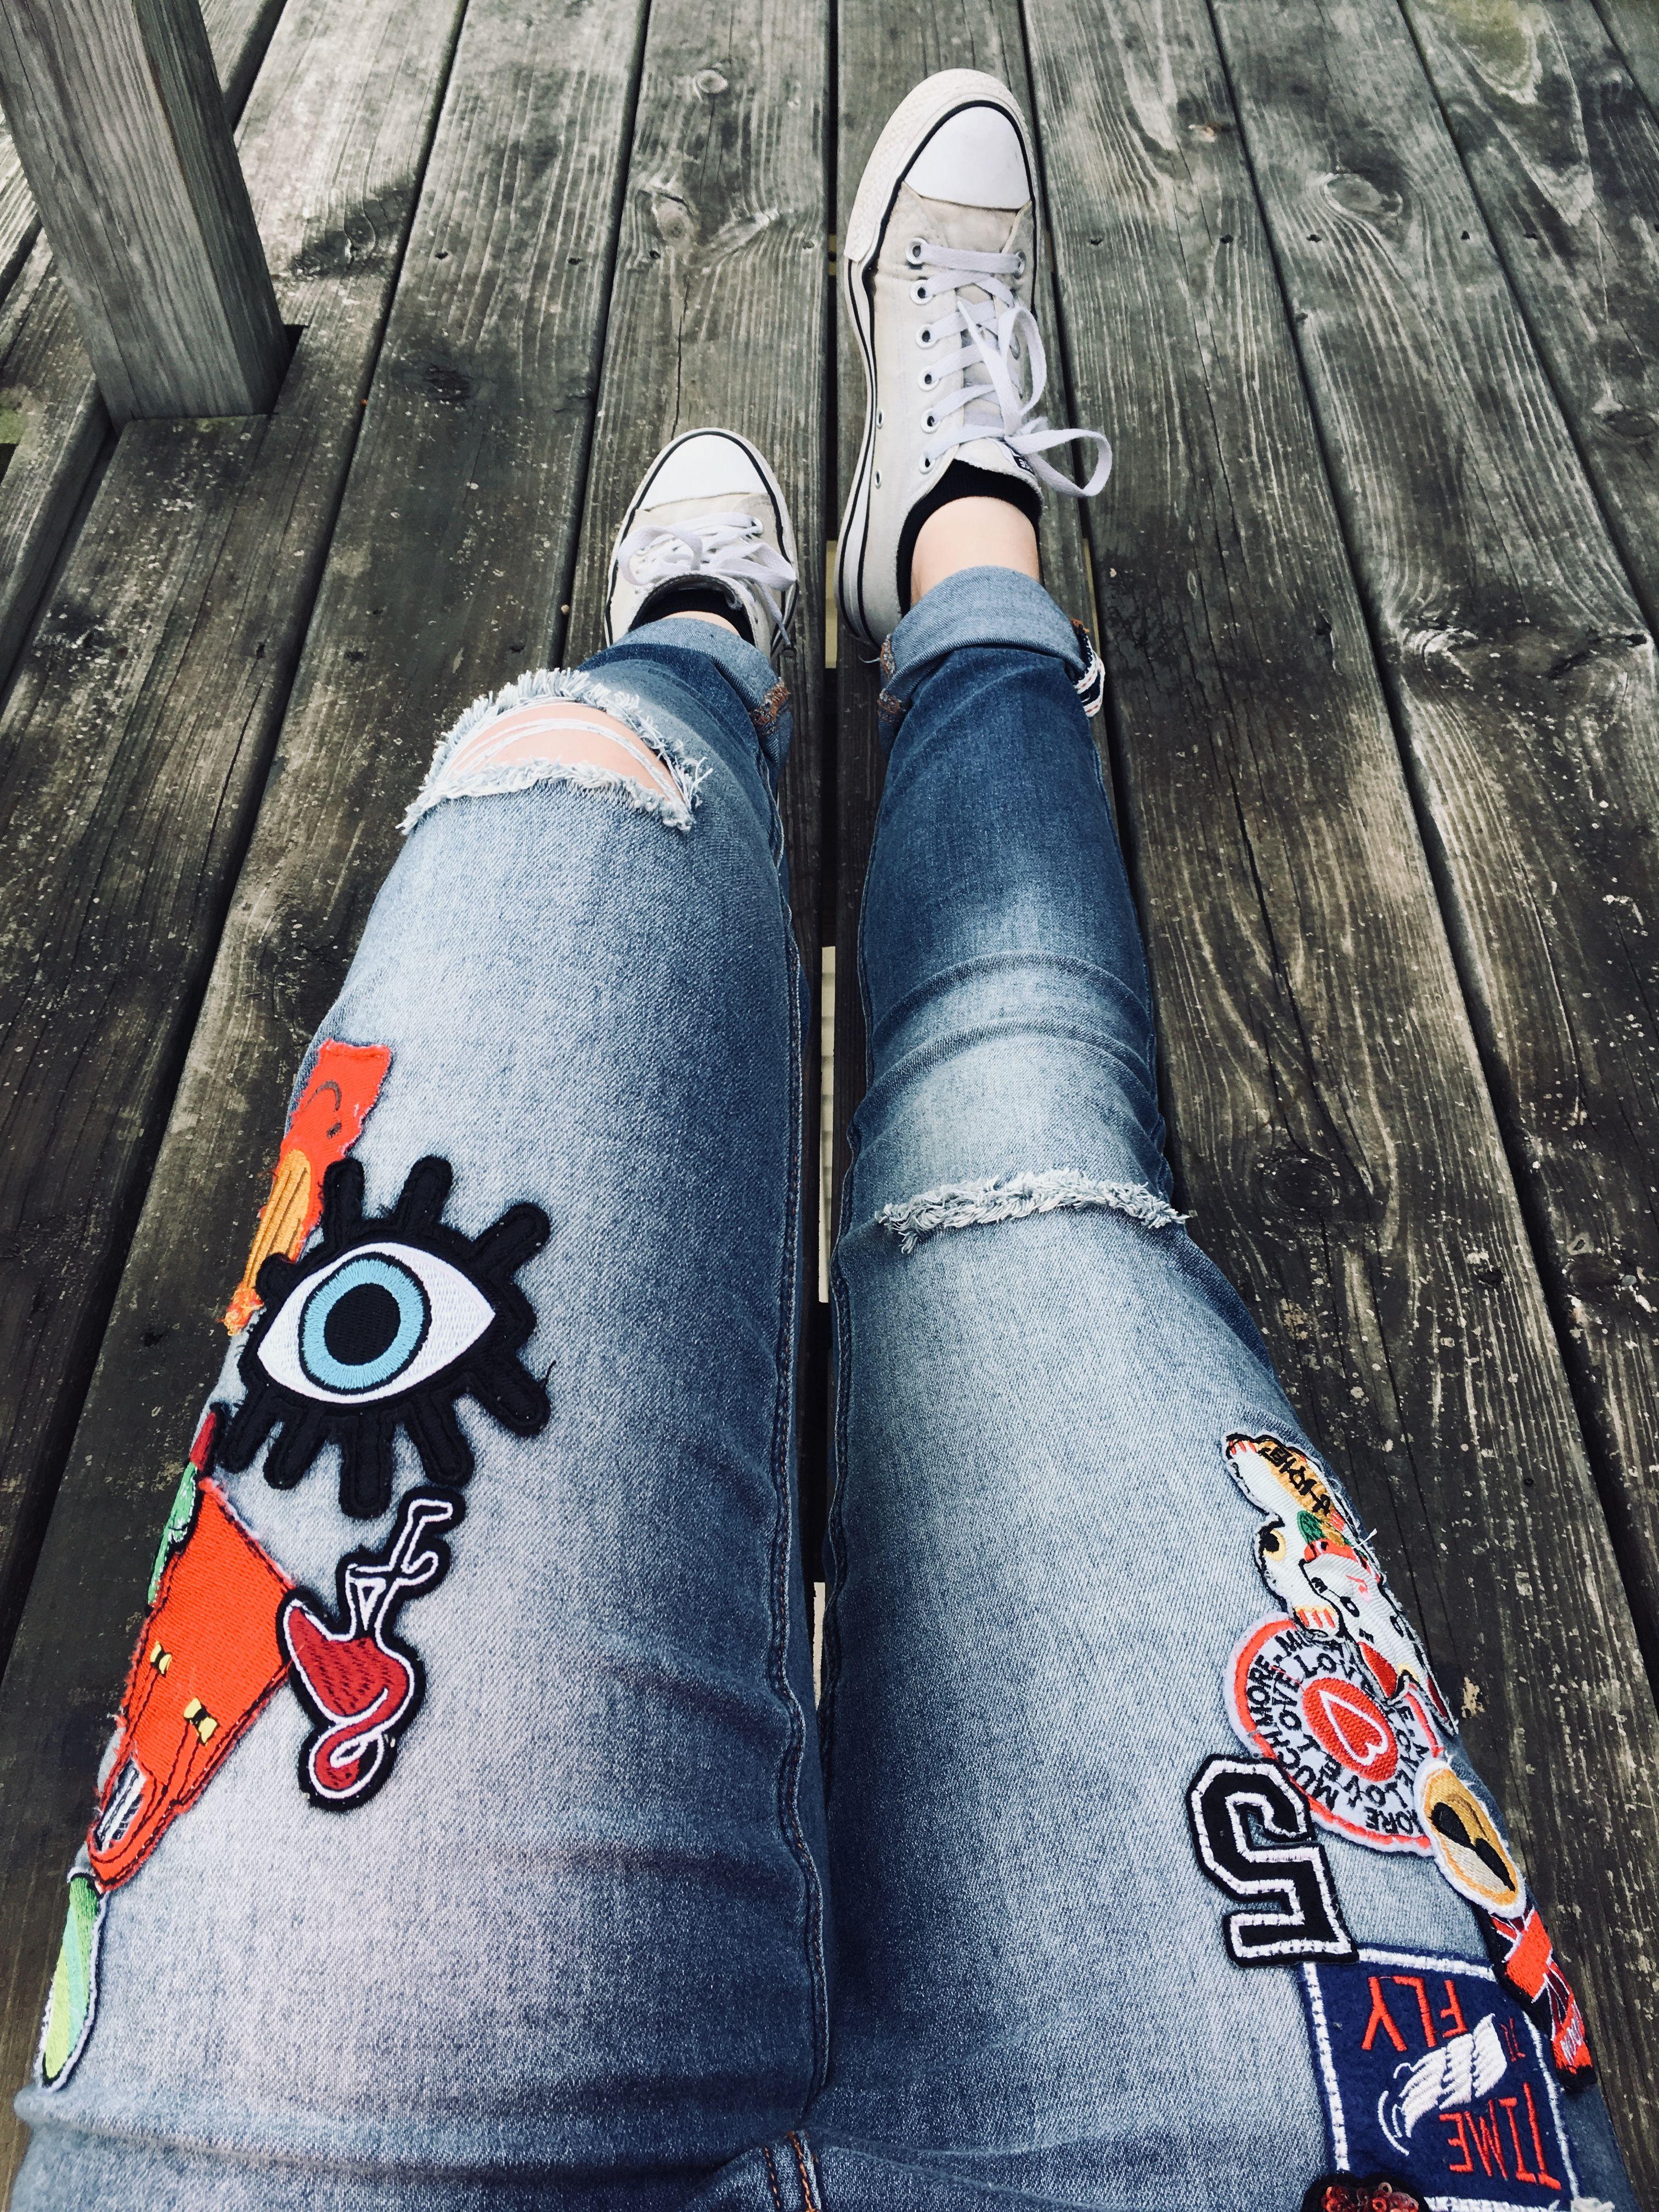 prada shoes tumblr gifs aesthetic ocean